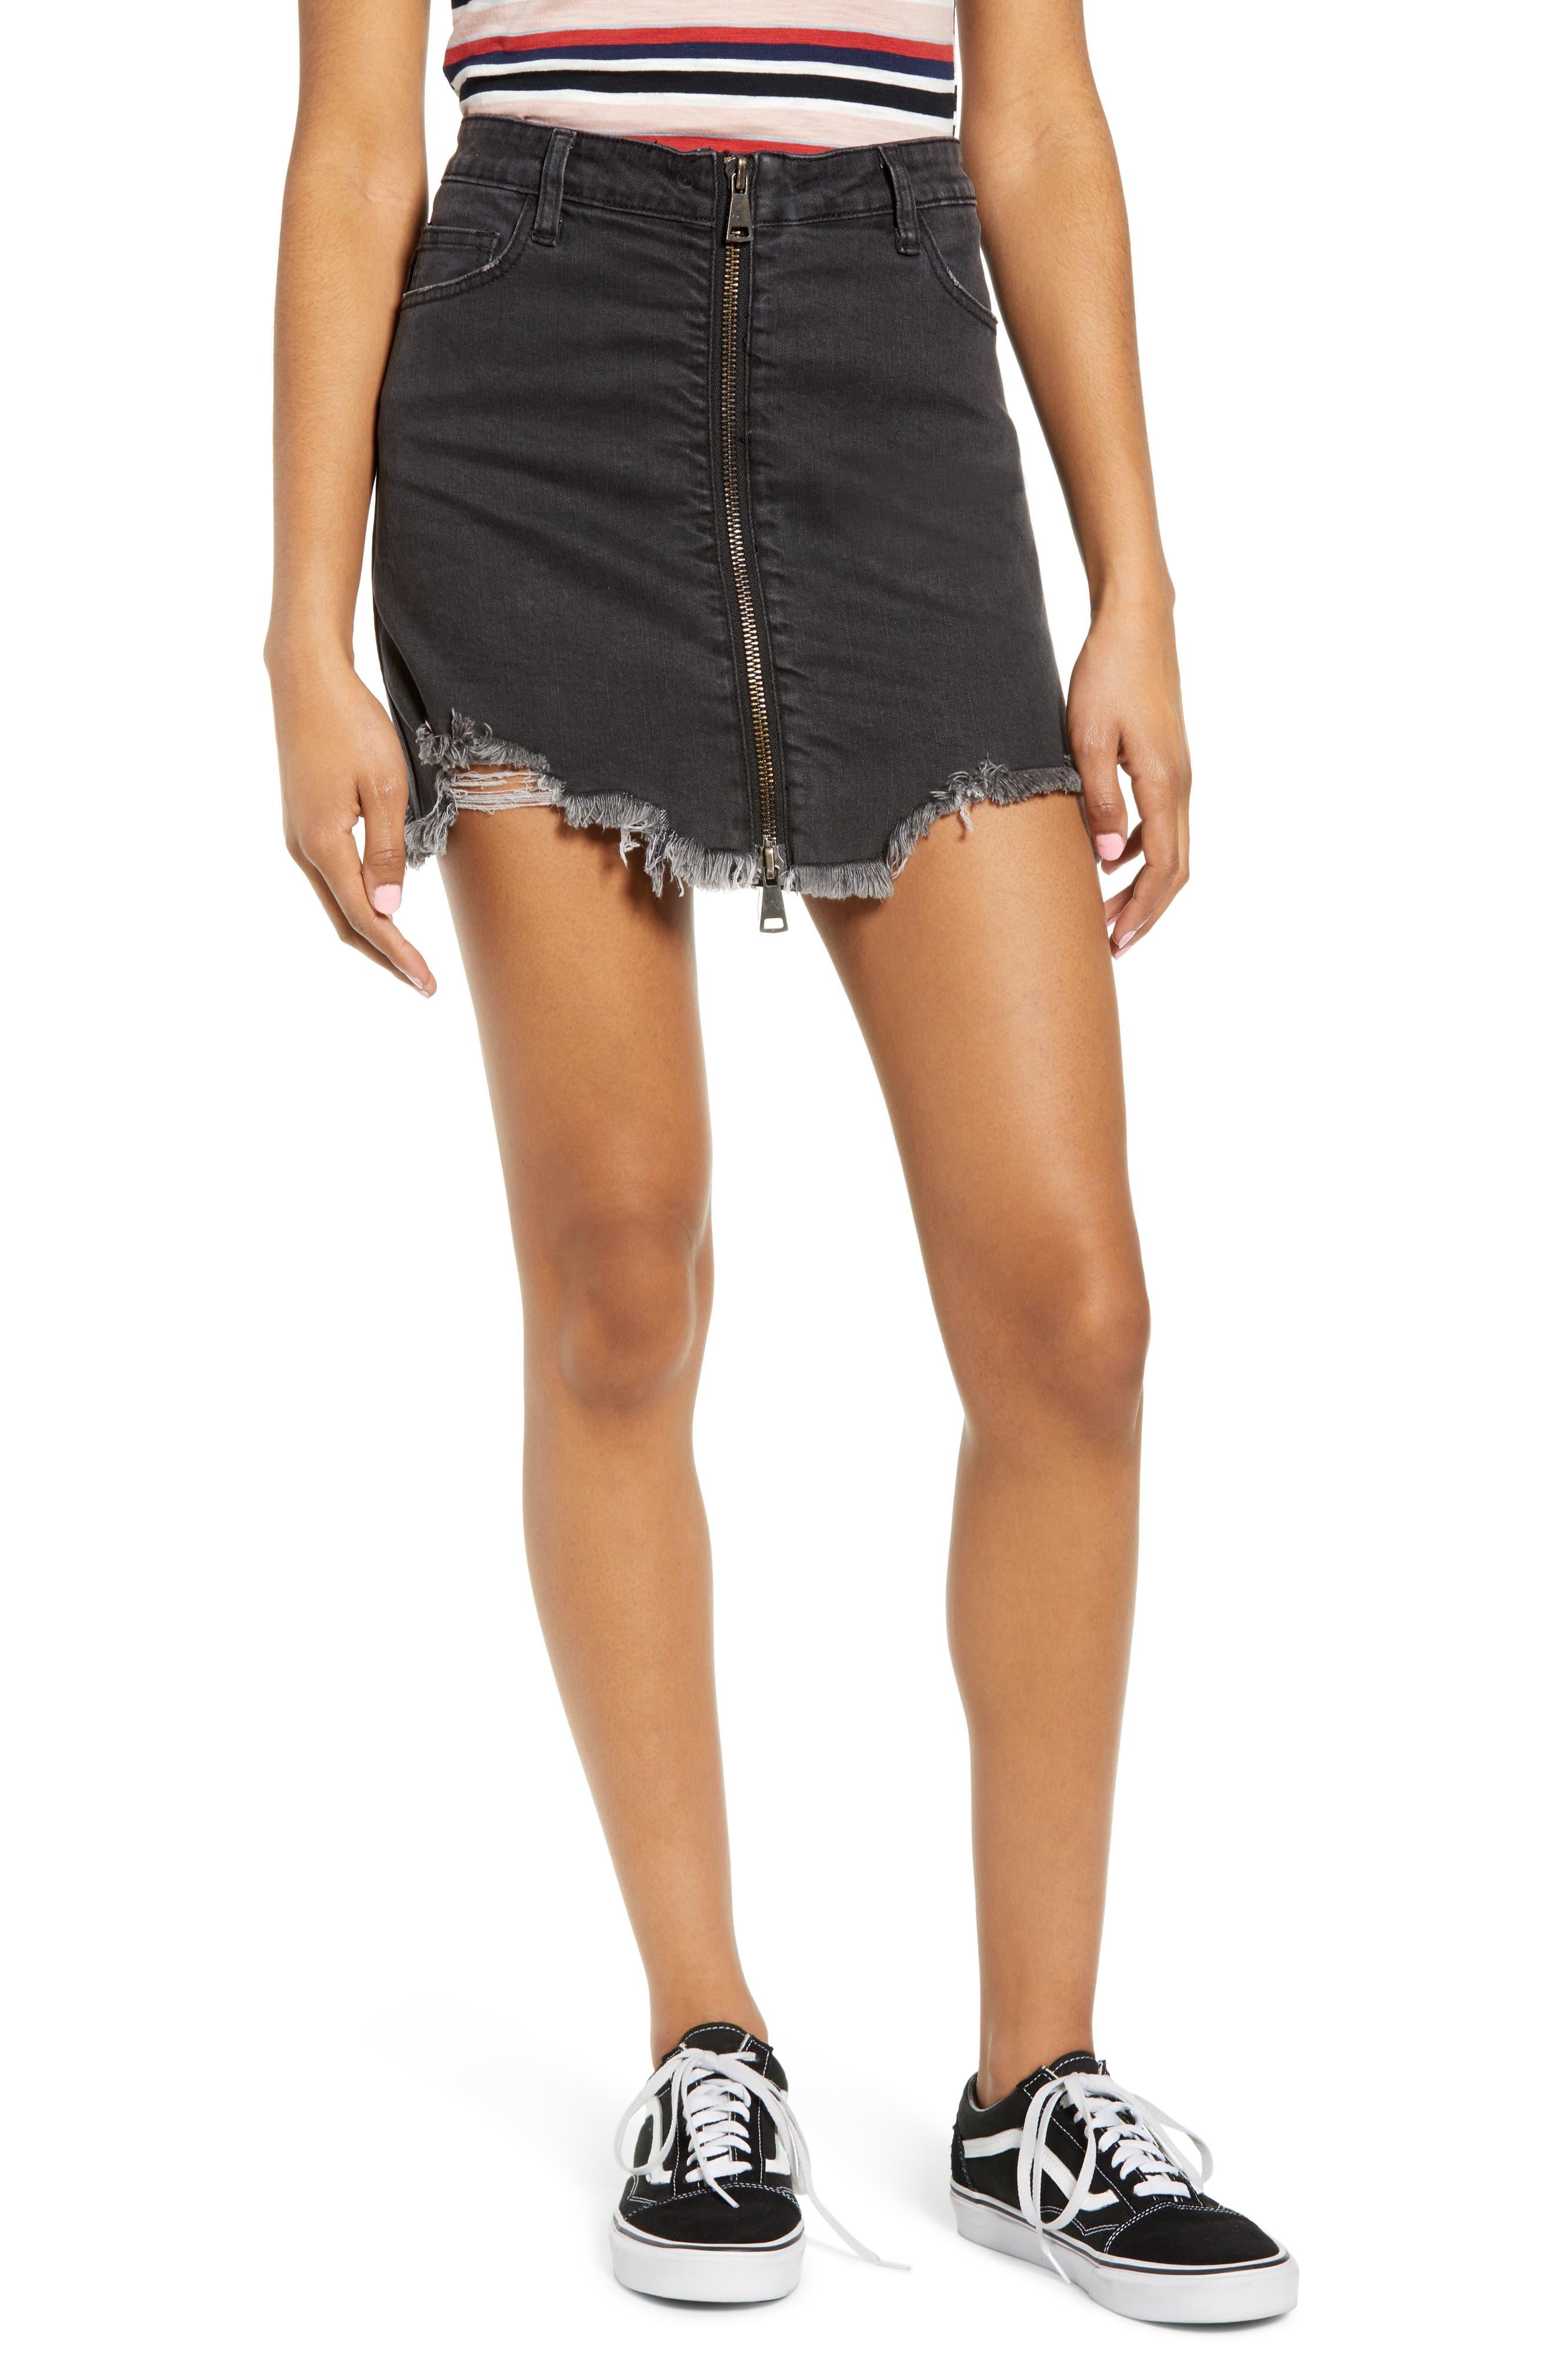 Cobra Ripped Denim Skirt,                             Main thumbnail 1, color,                             BLACK